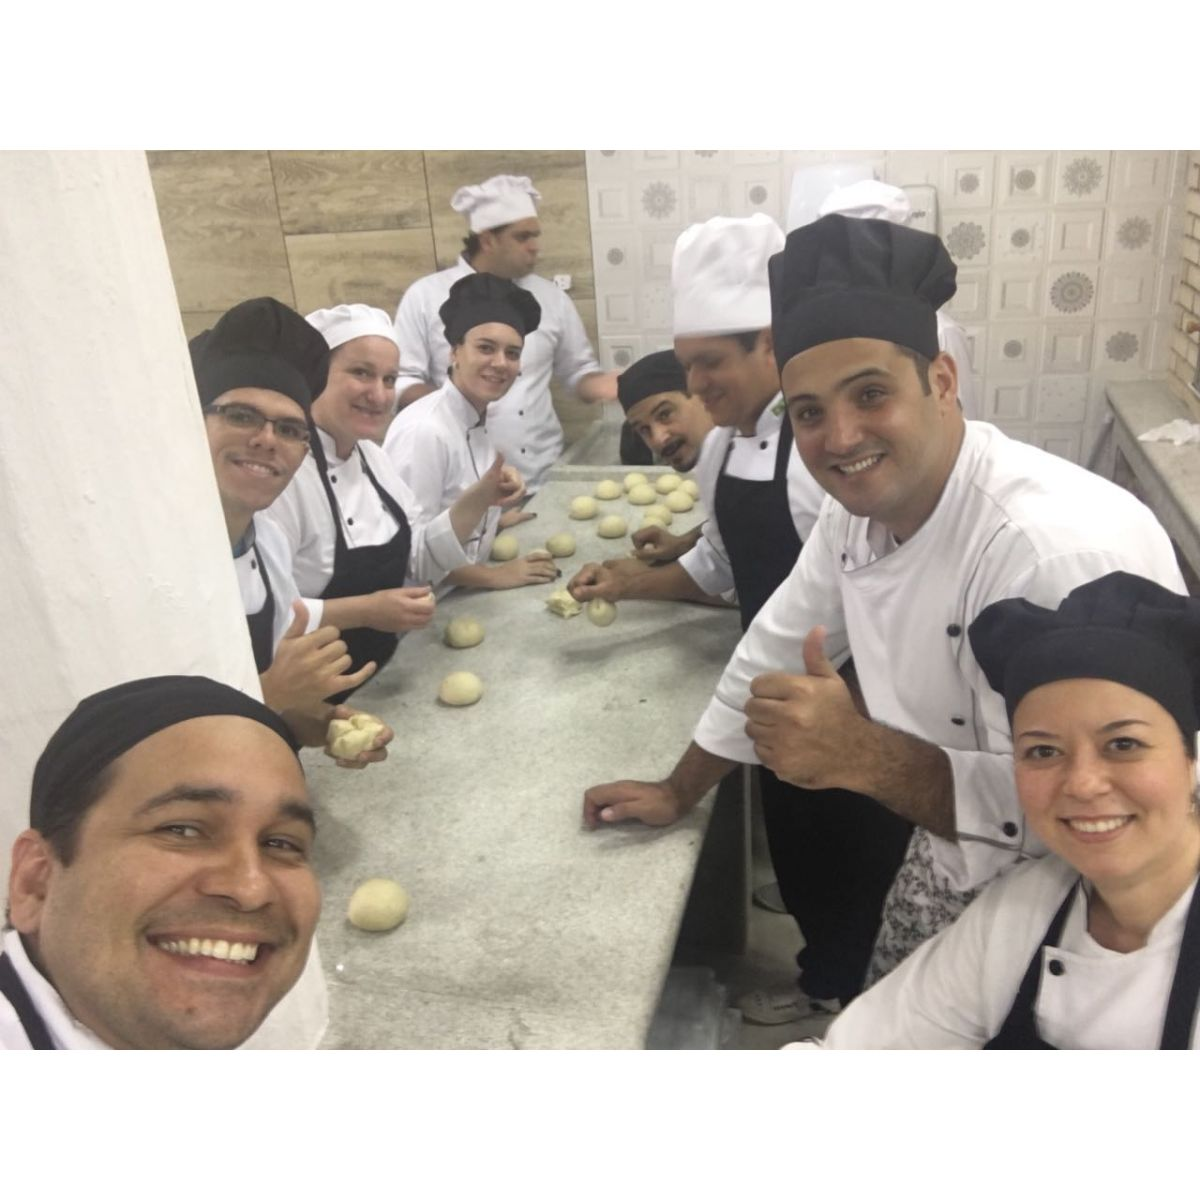 CURSO DE ESFIHAS   - Fórum de Pizzas Vendas online